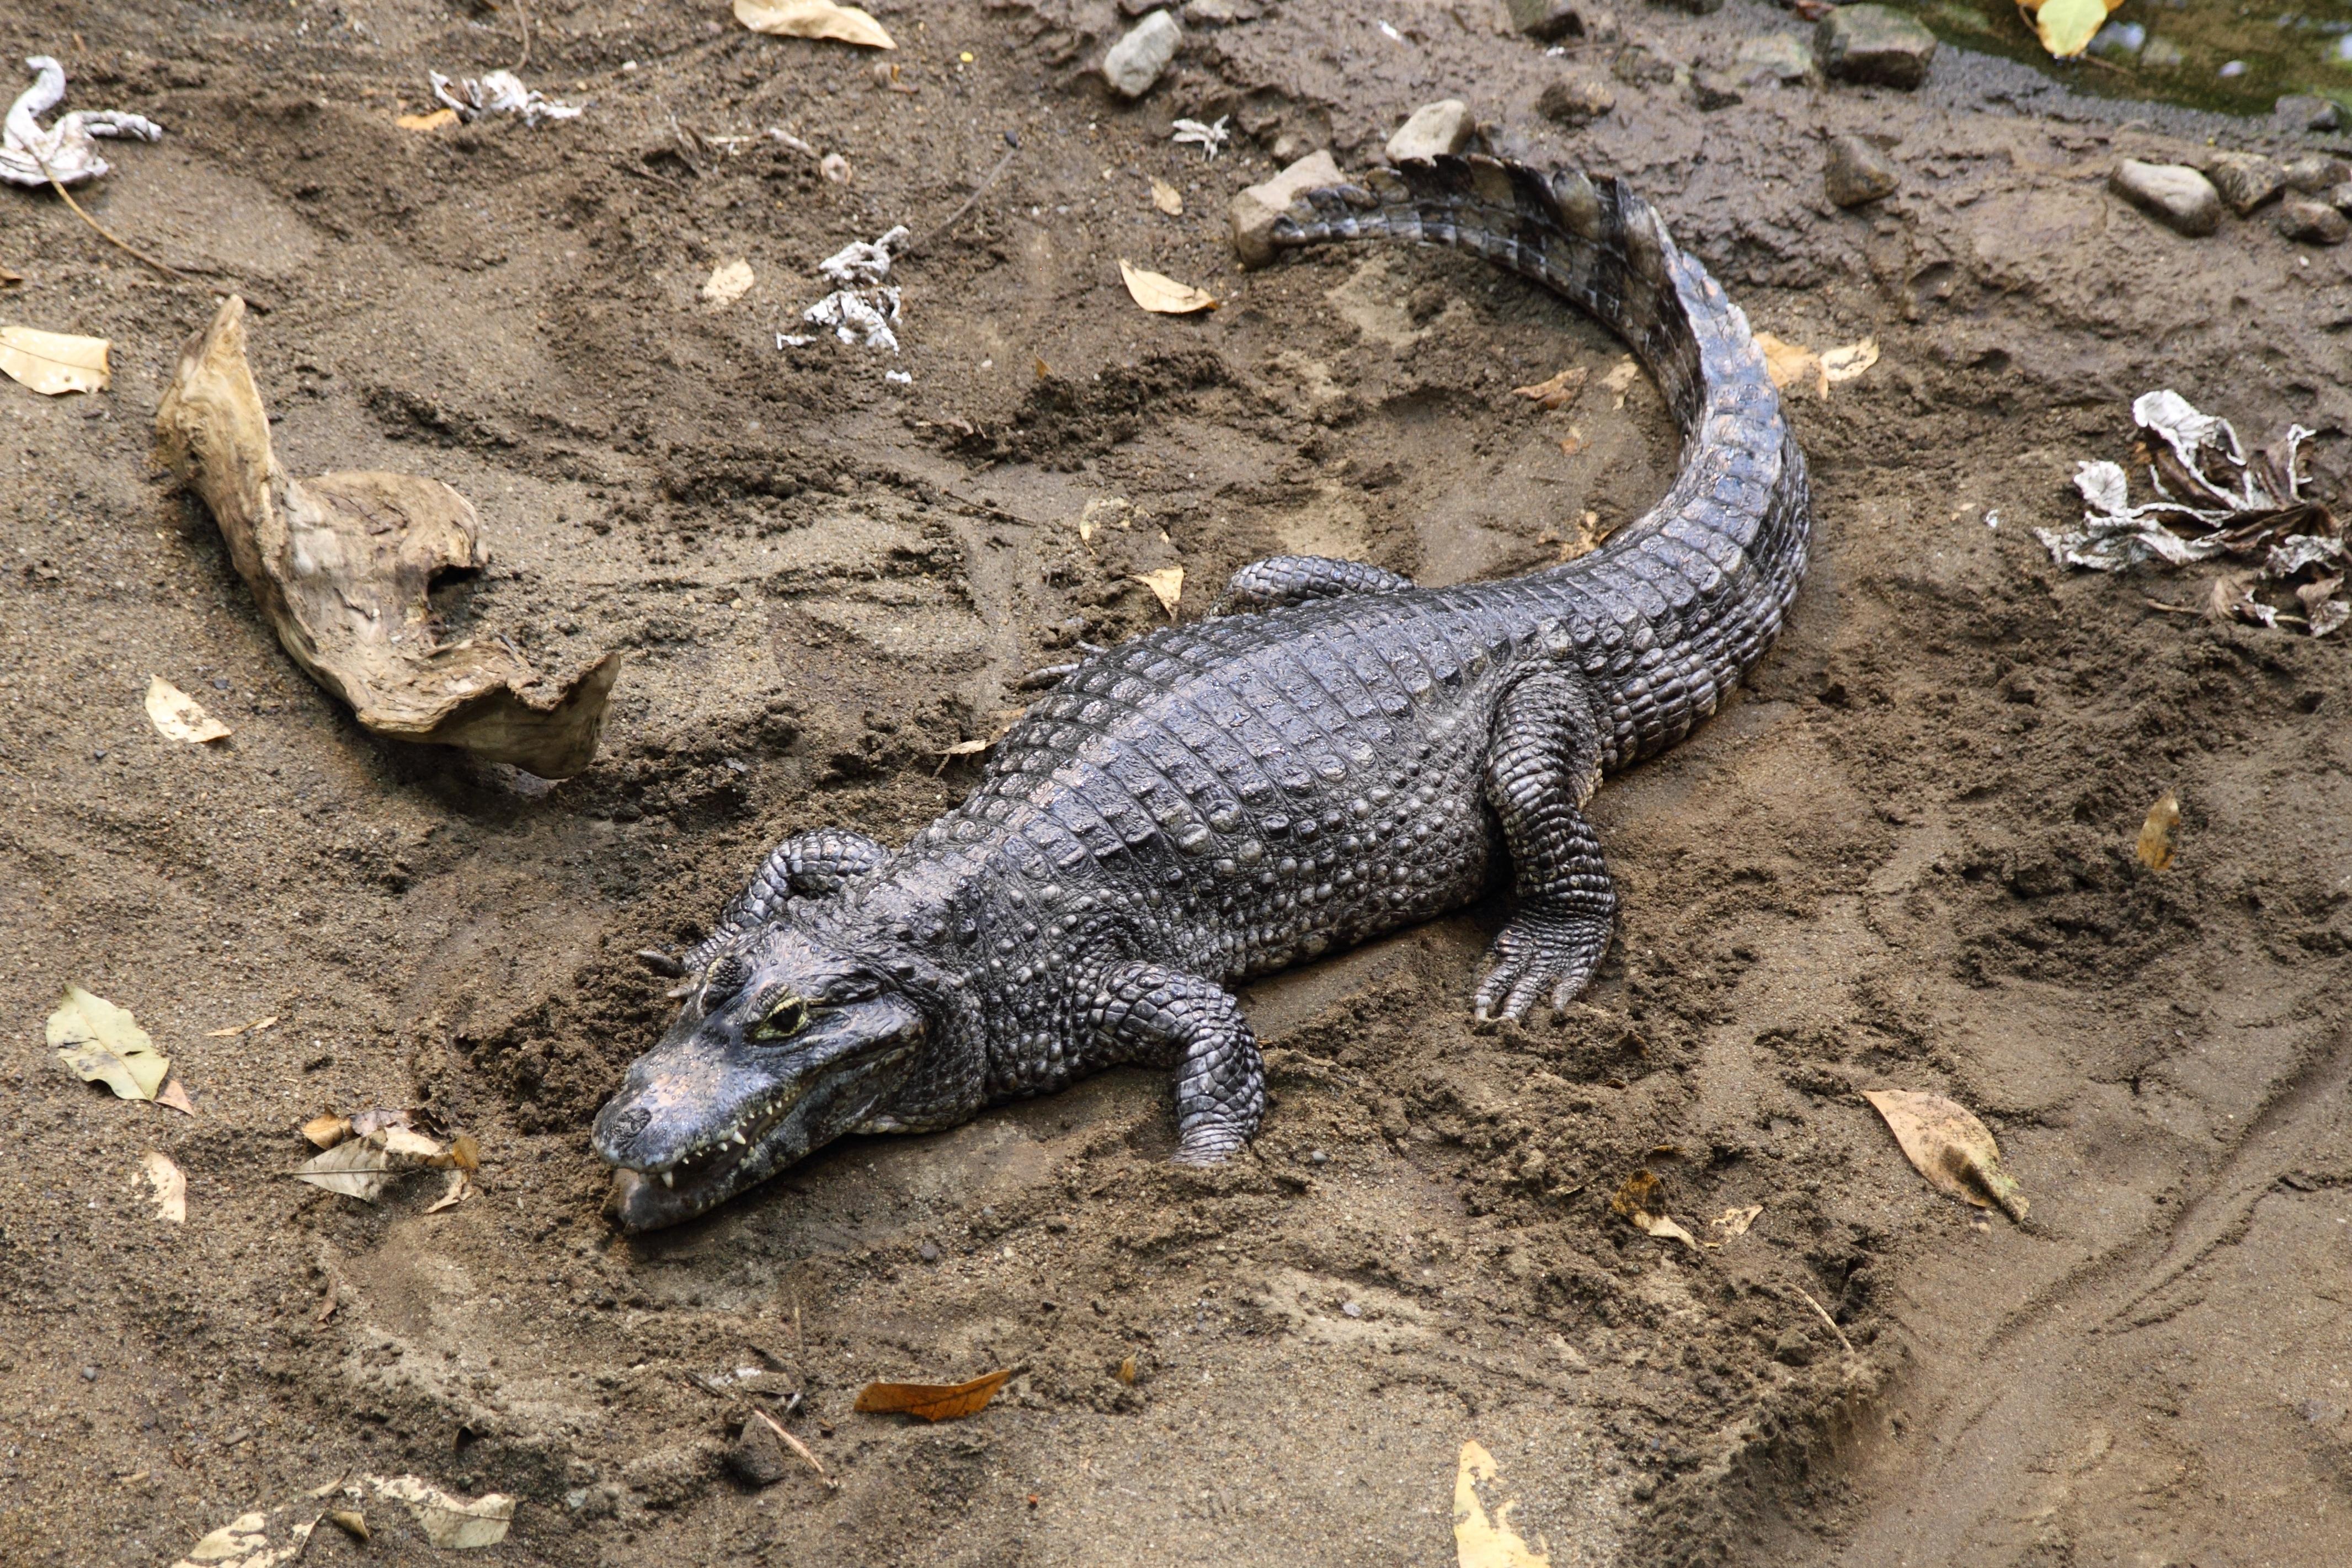 File:Caiman_yacare_BM on Rain Forest Ecosystem